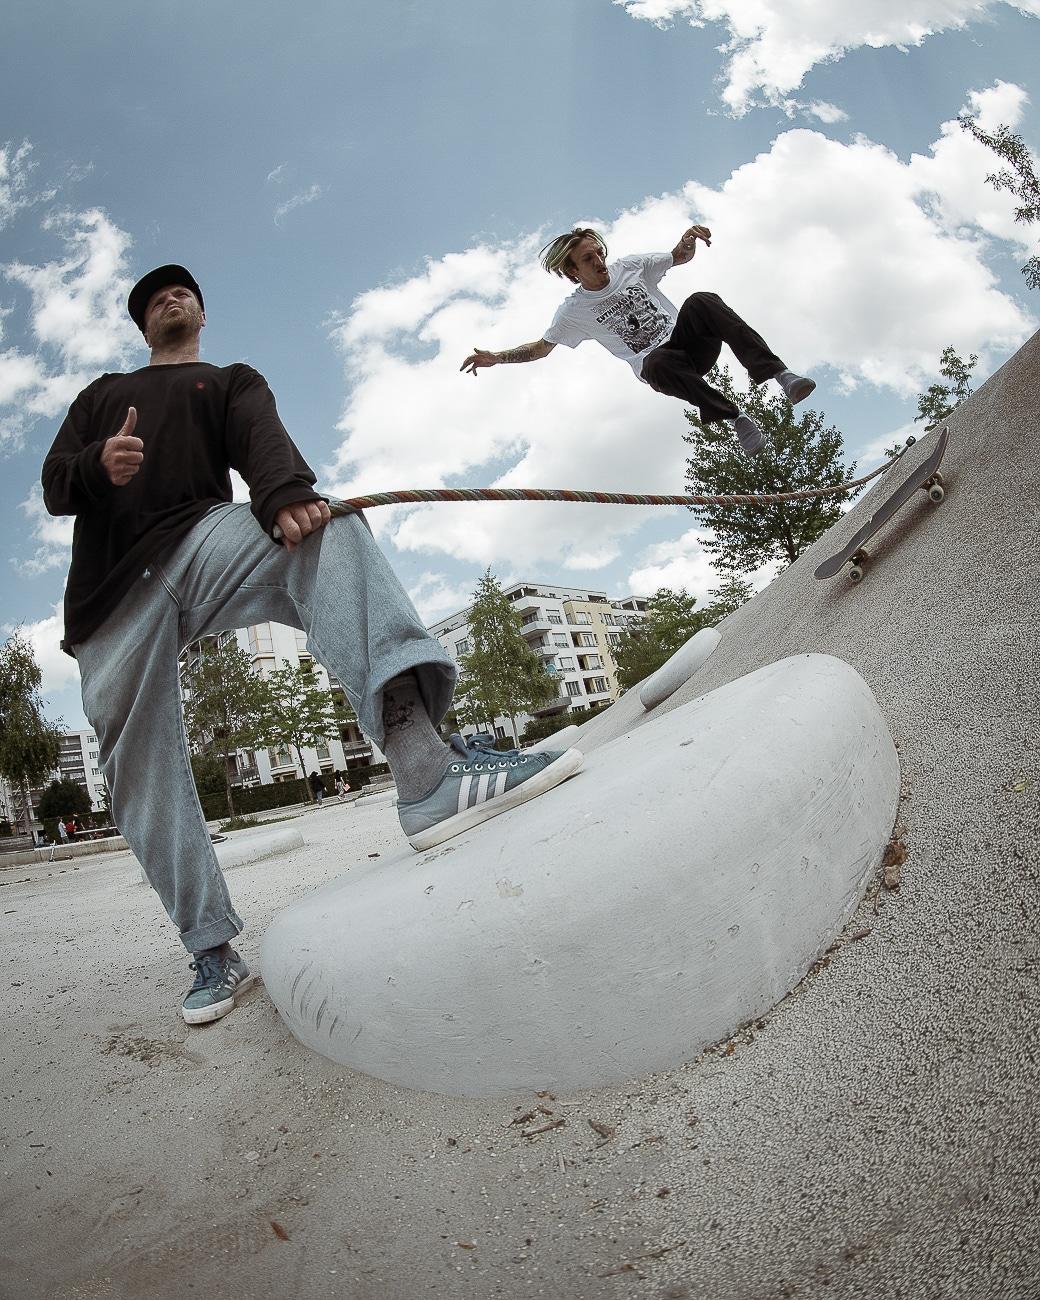 red-bull-skateboard-feinkost-irregularskatemag-fabian-reichenbach-4